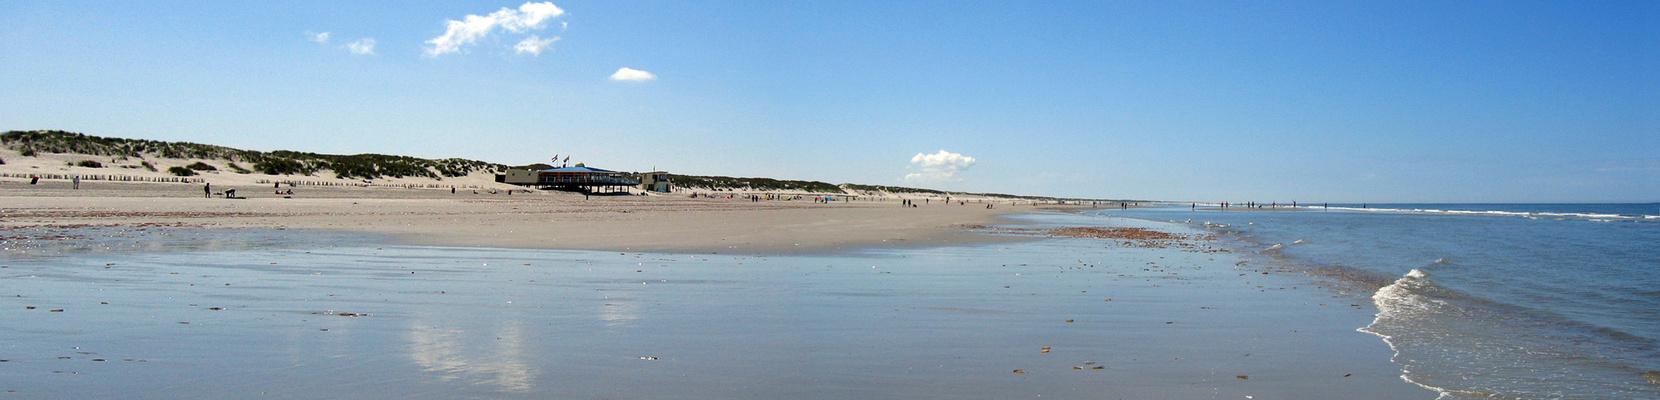 Panorama - Strand bei Nes / Ameland, NL